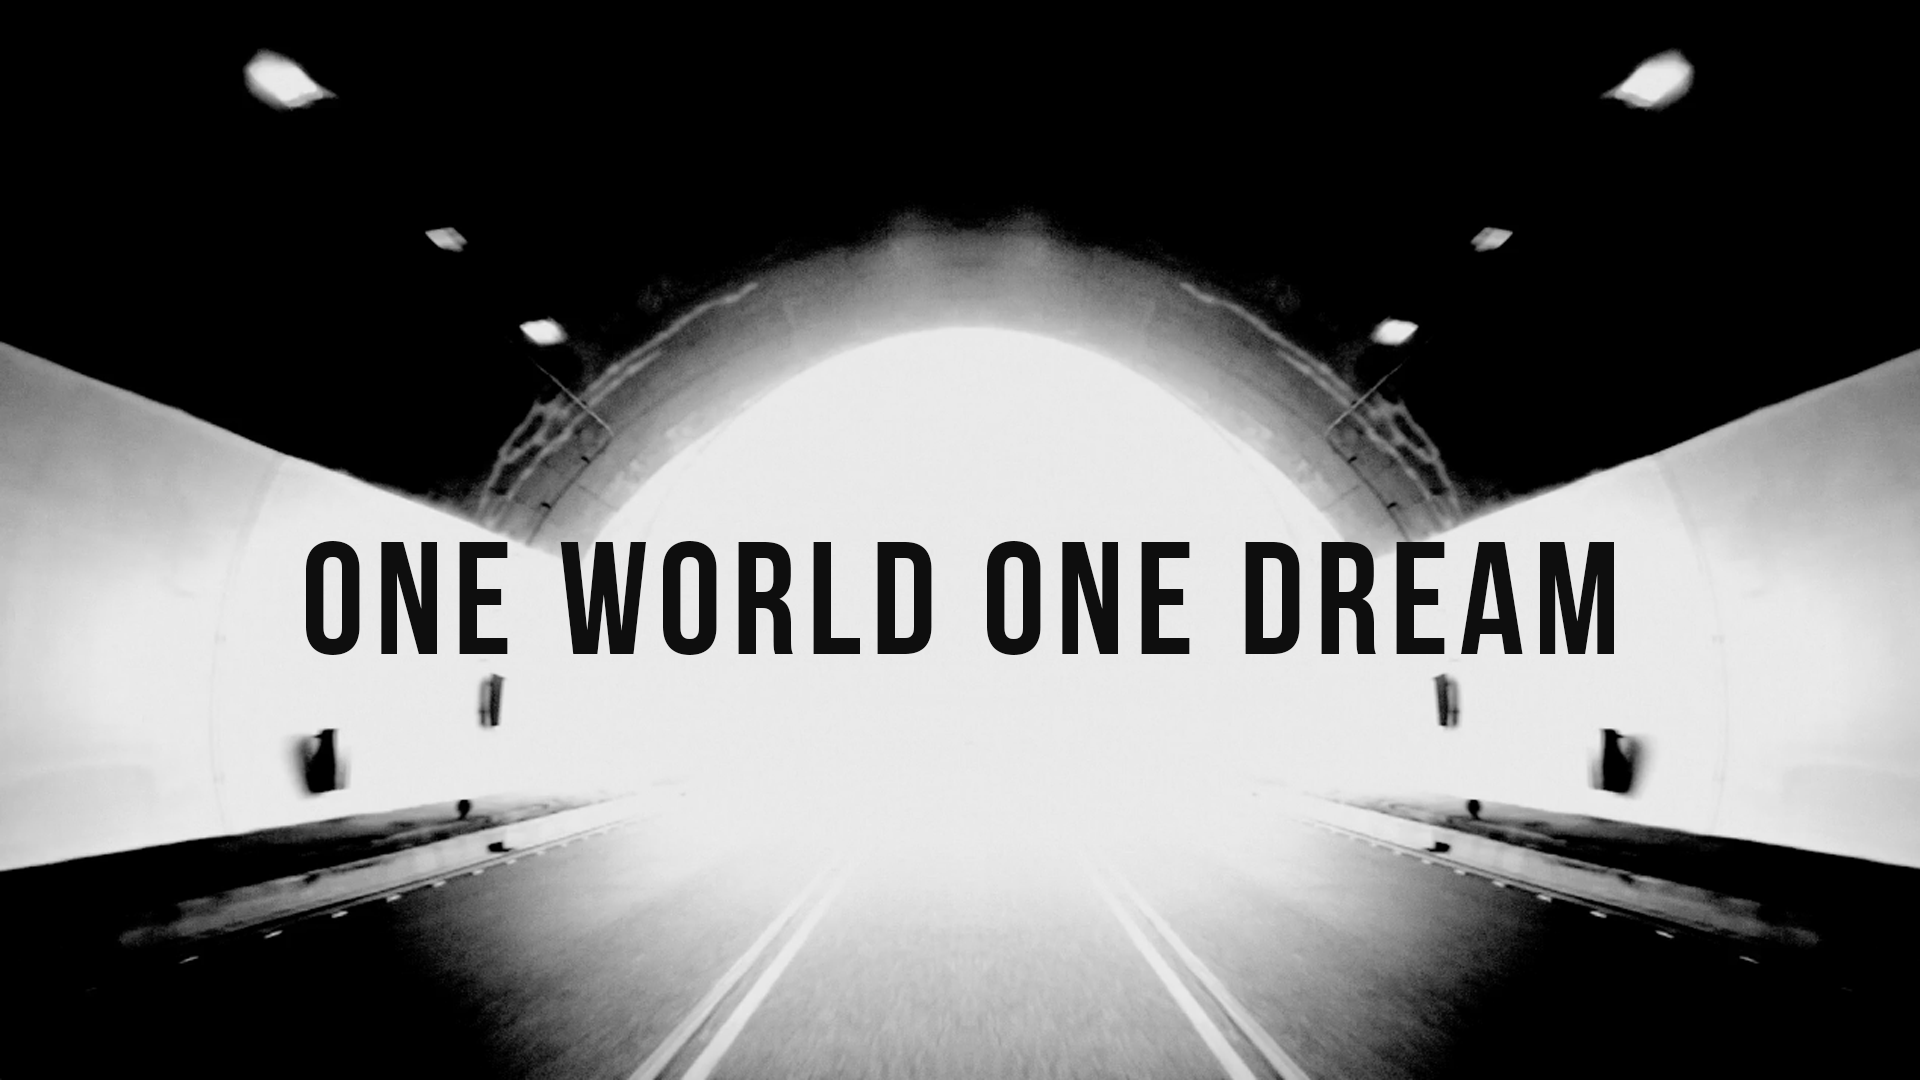 Titelsequenz One World One Dream